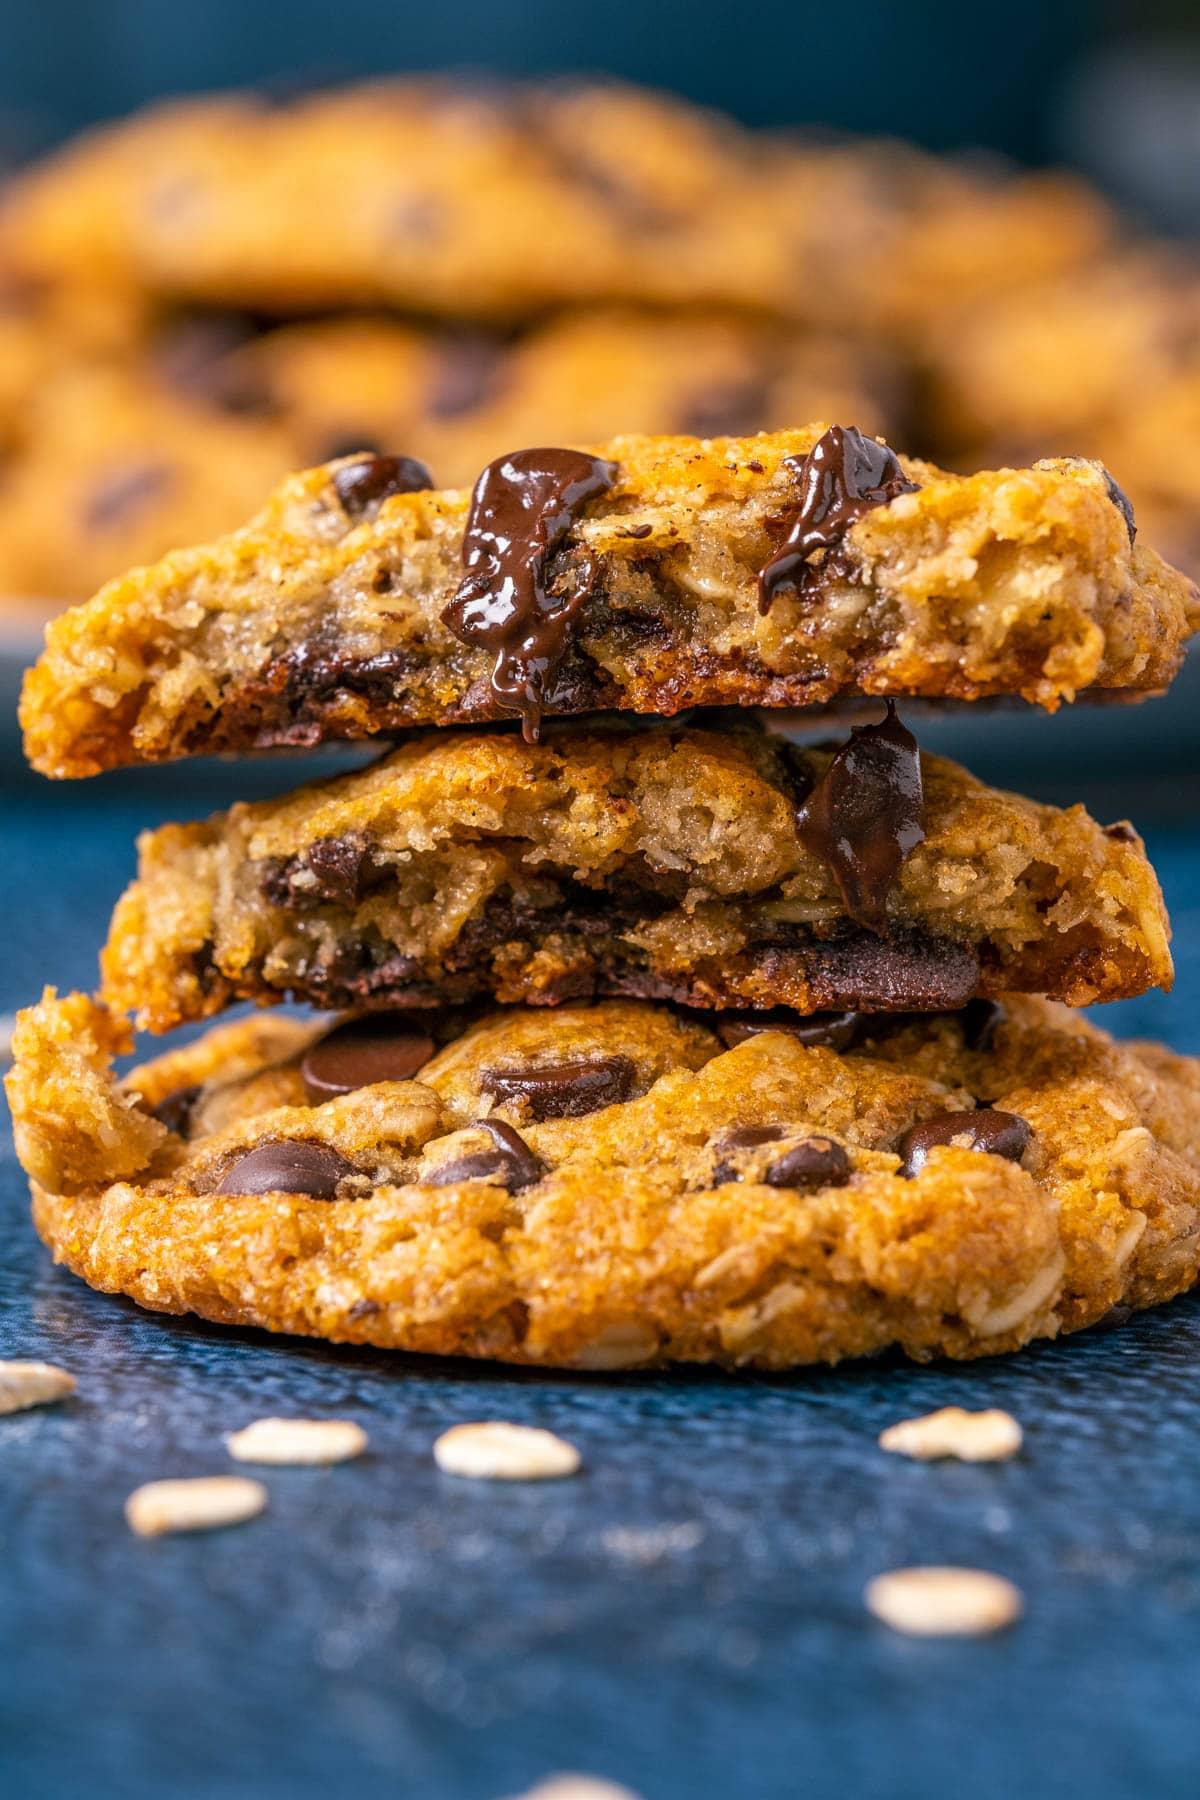 Vegan oatmeal chocolate chip cookie broken in half.